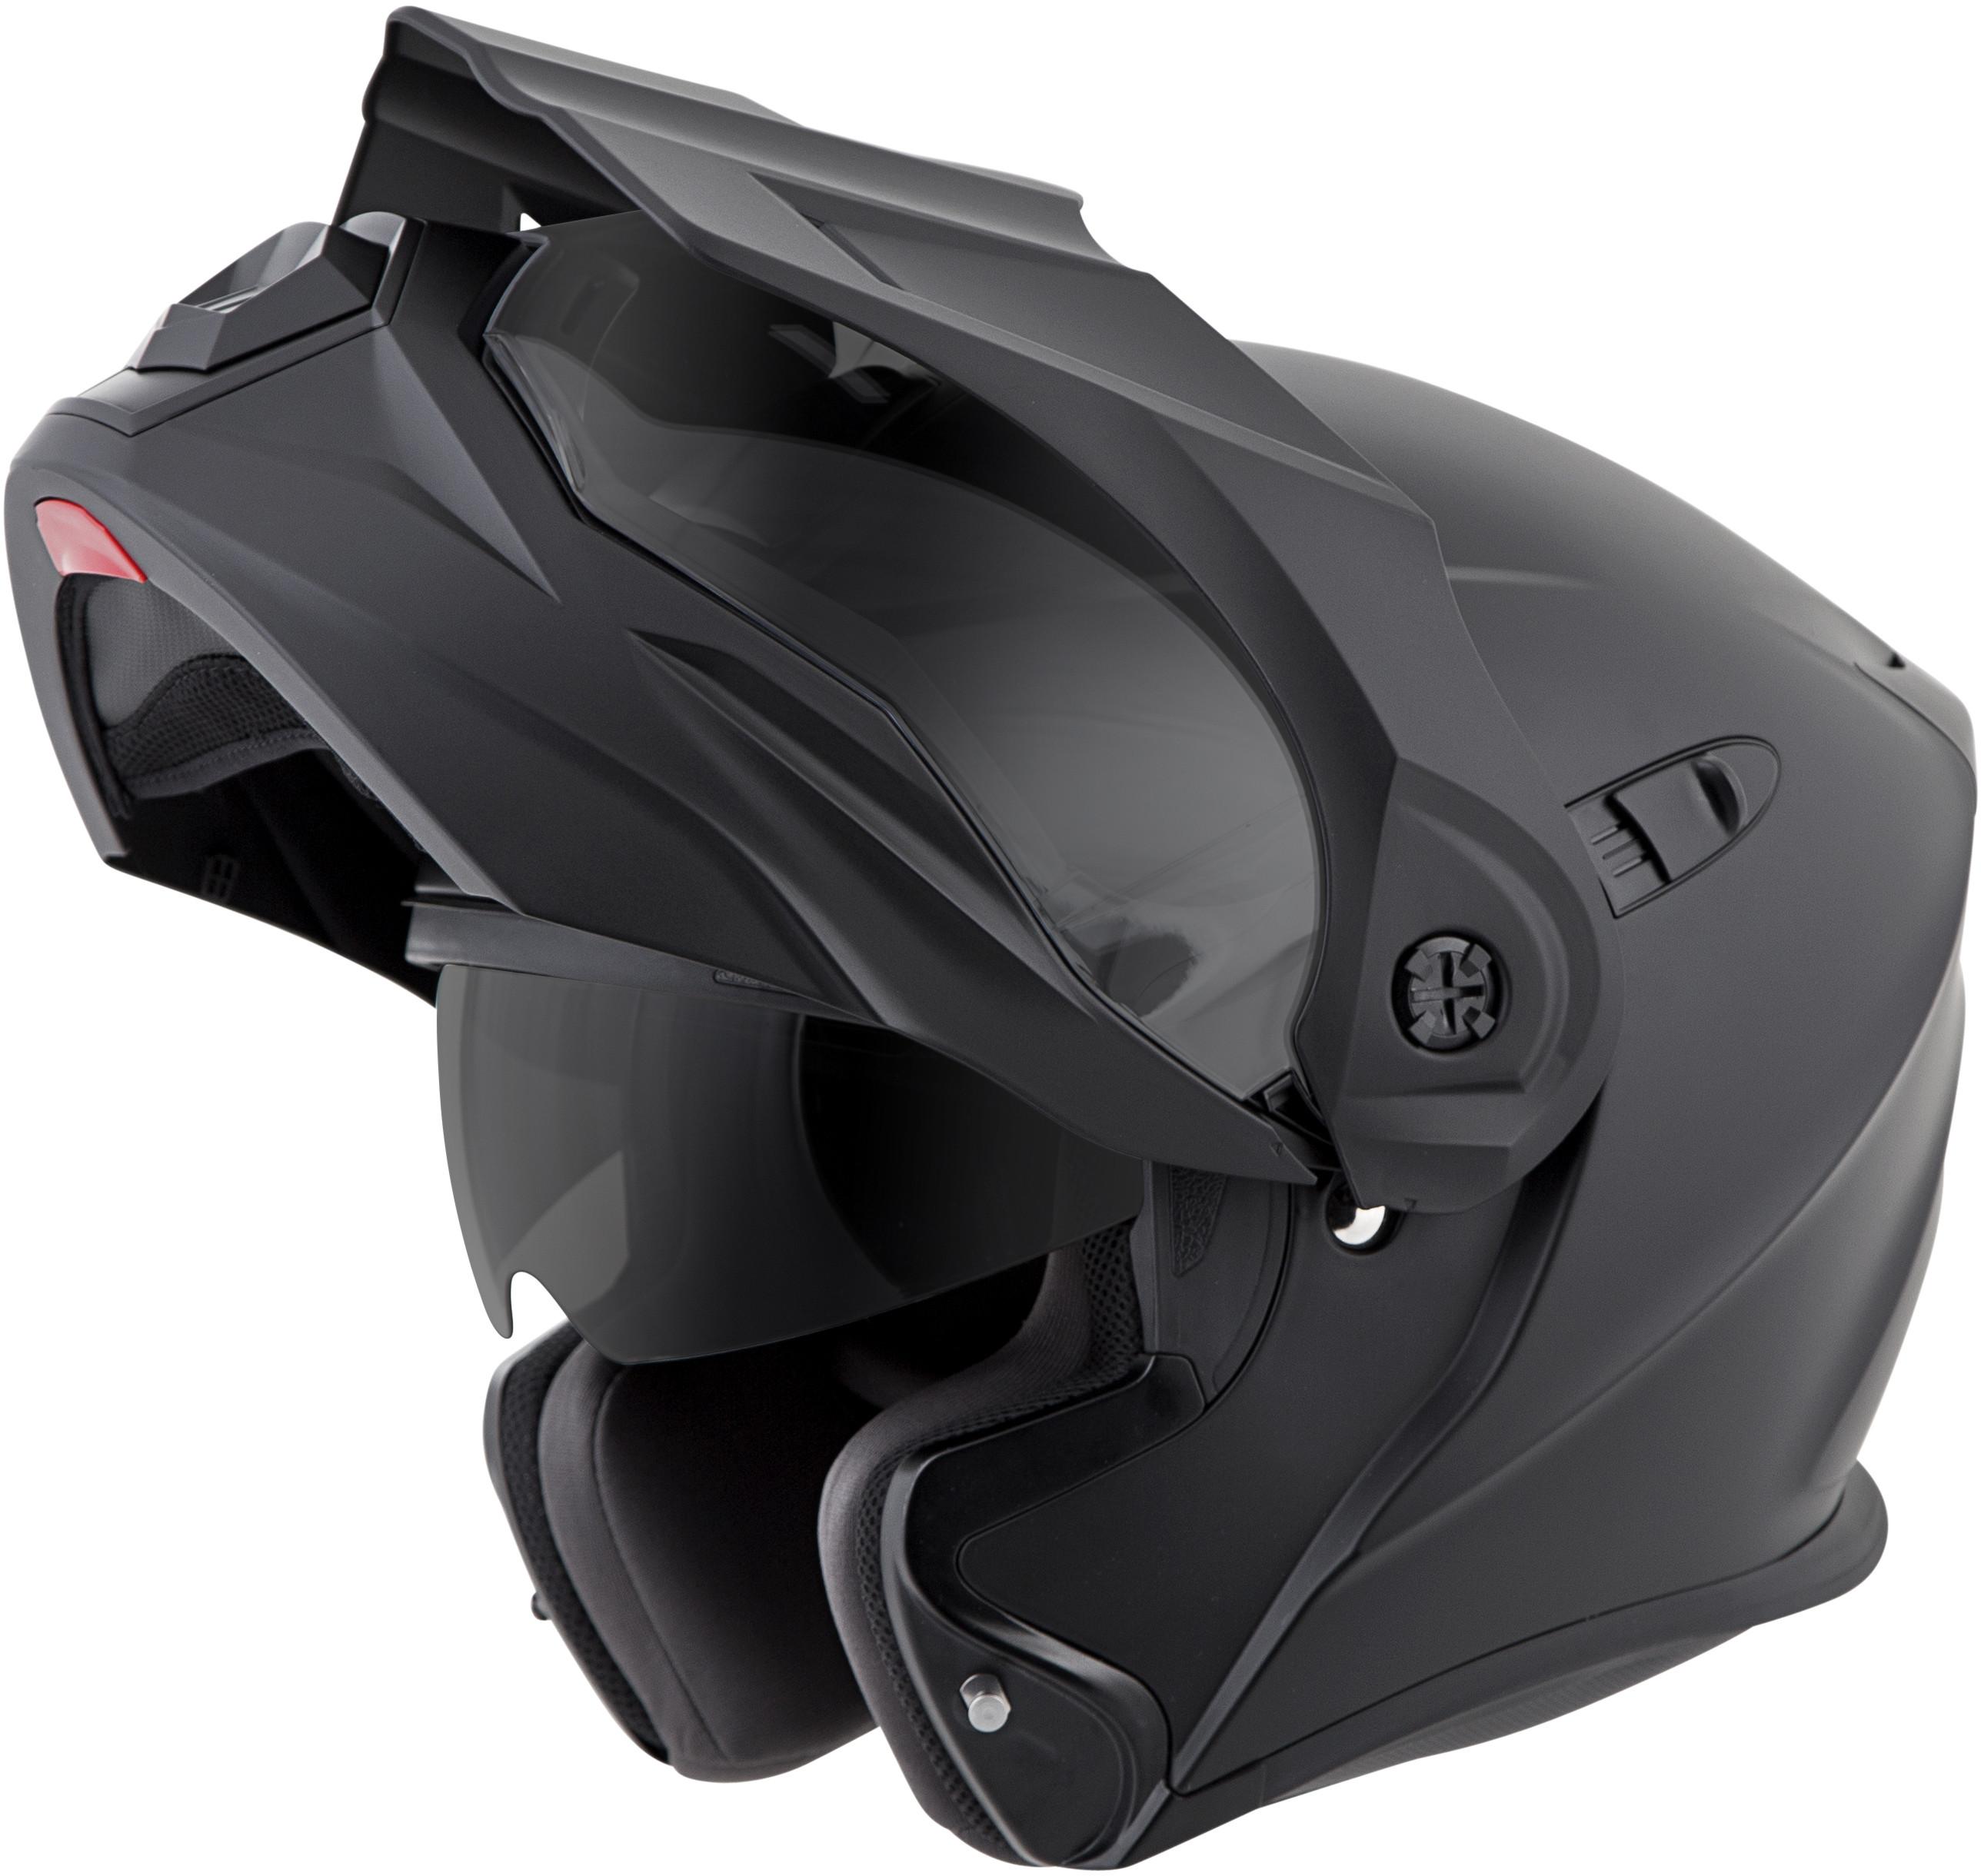 Scorpion-Helmet-EXO-AT950-Solid-Helmet miniature 11